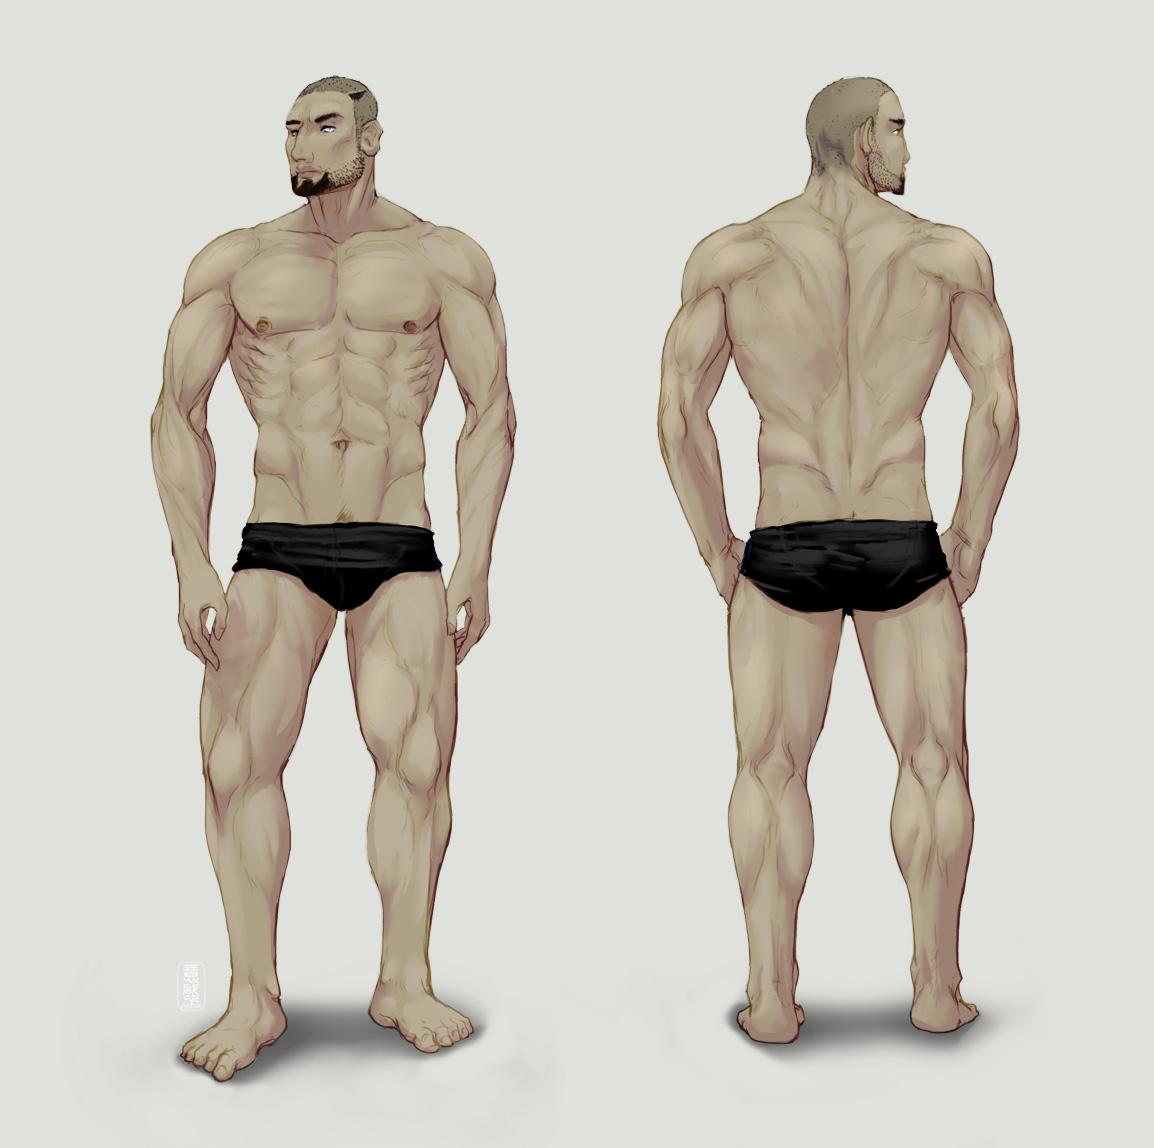 Art-test 011: Anatomy gone wrong by fydbac on DeviantArt